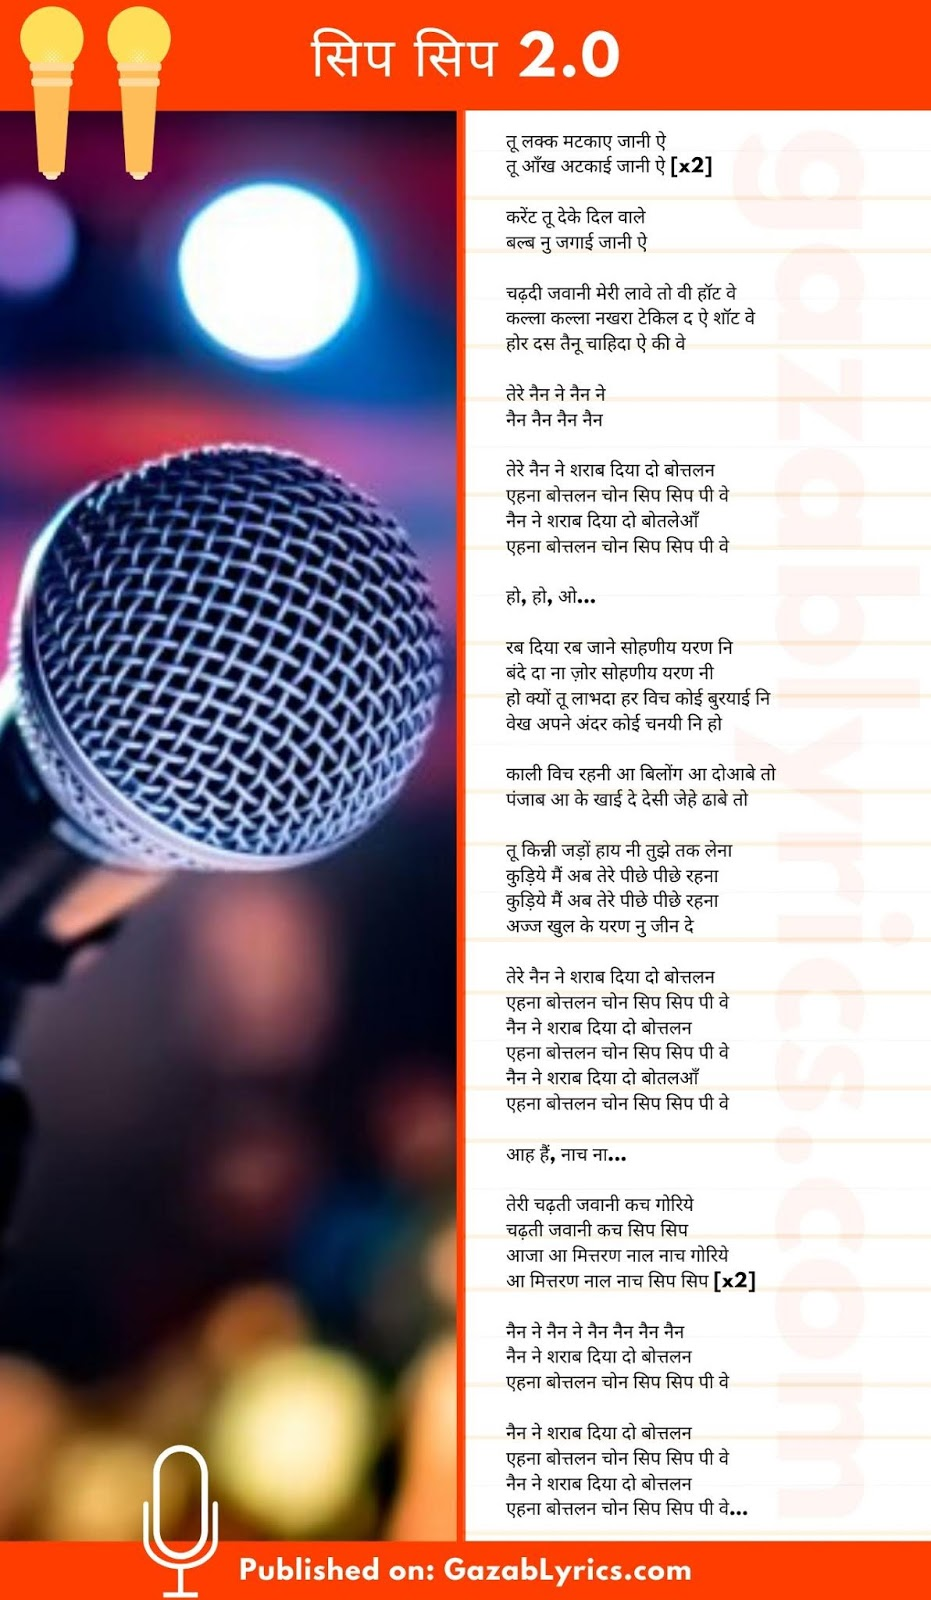 Sip Sip 2.0 song lyrics image